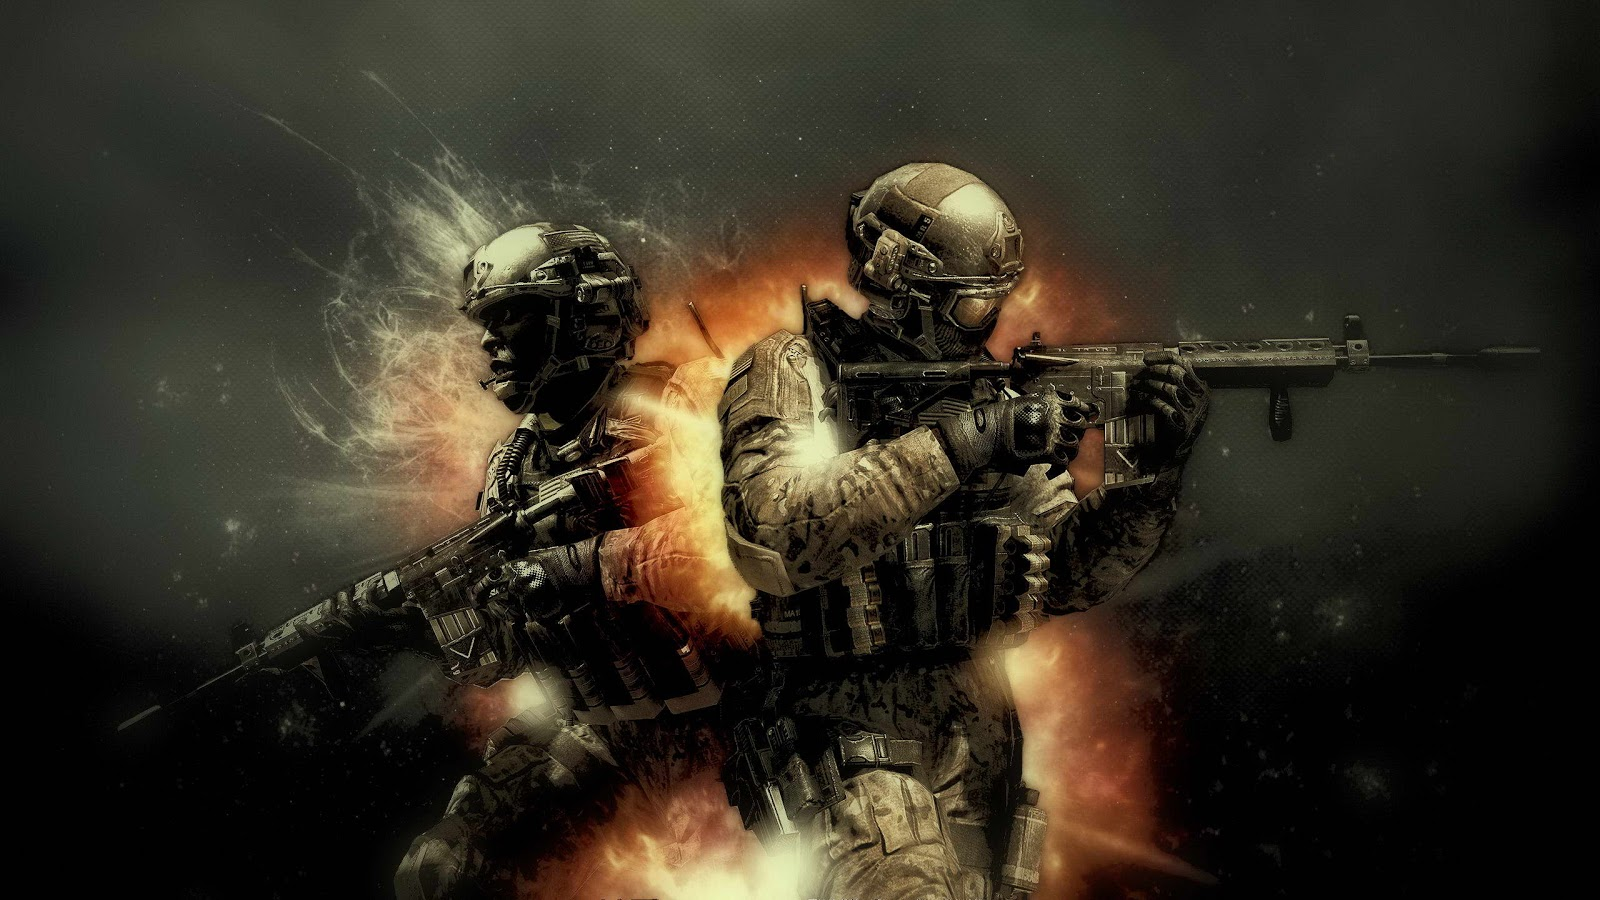 Call Of Duty Black Ops 2 Elite Wallpaper